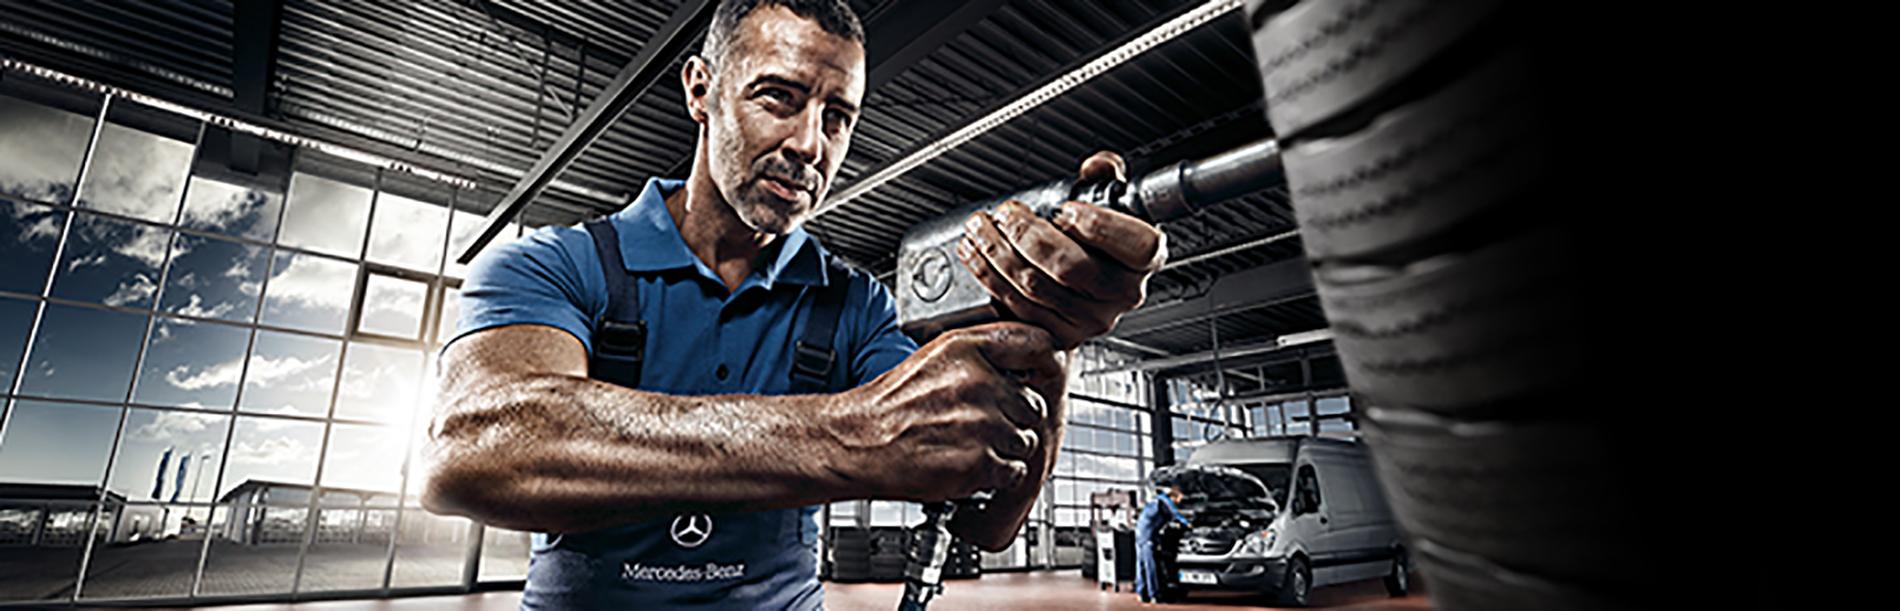 Mercedes benz service car image idea for Fairfield mercedes benz service